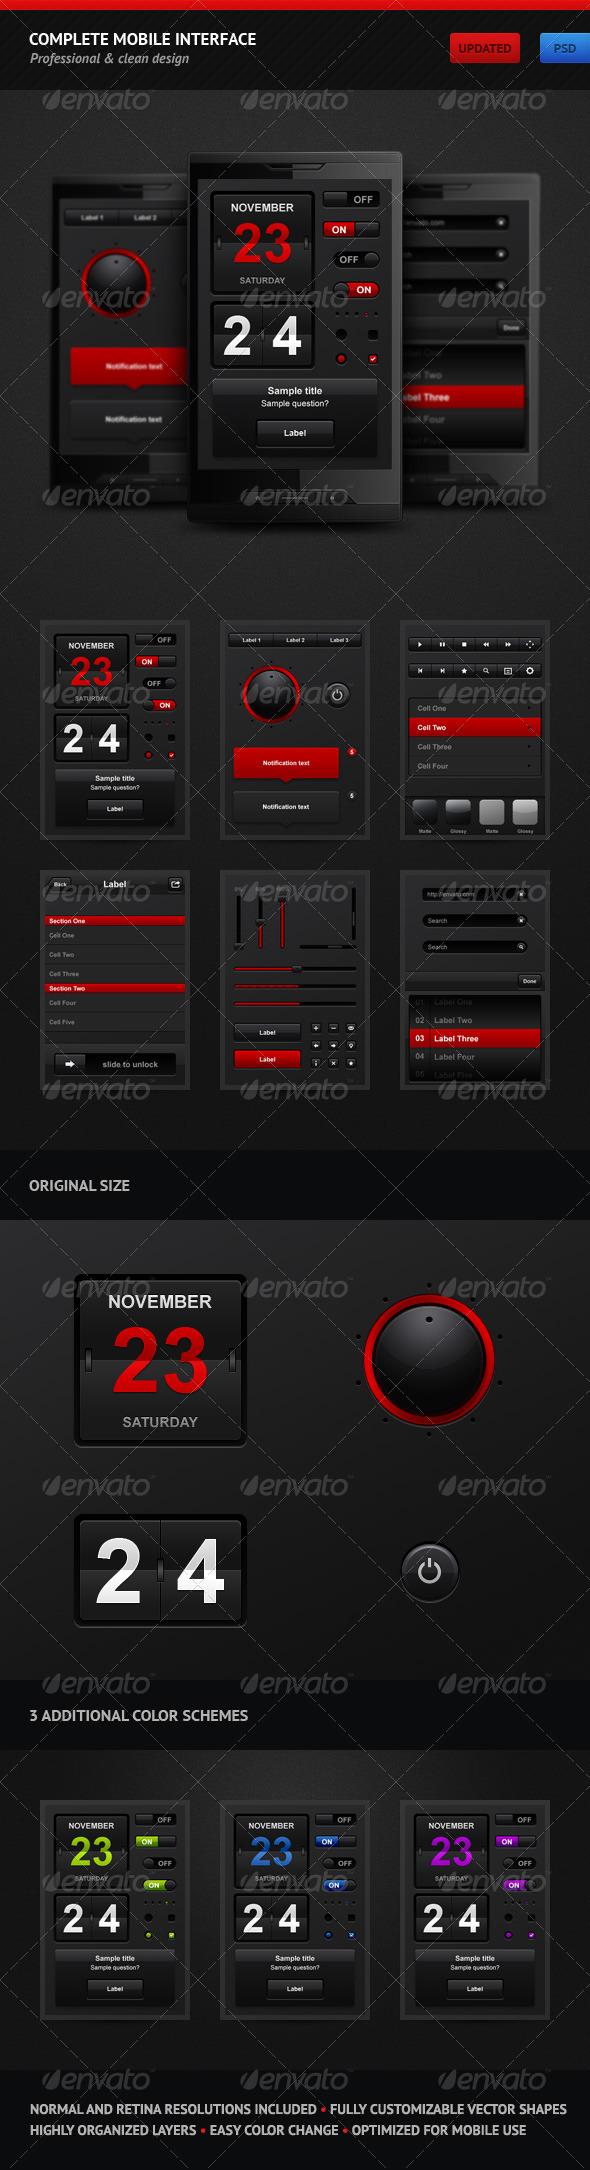 GraphicRiver Complete Mobile Interface 144245